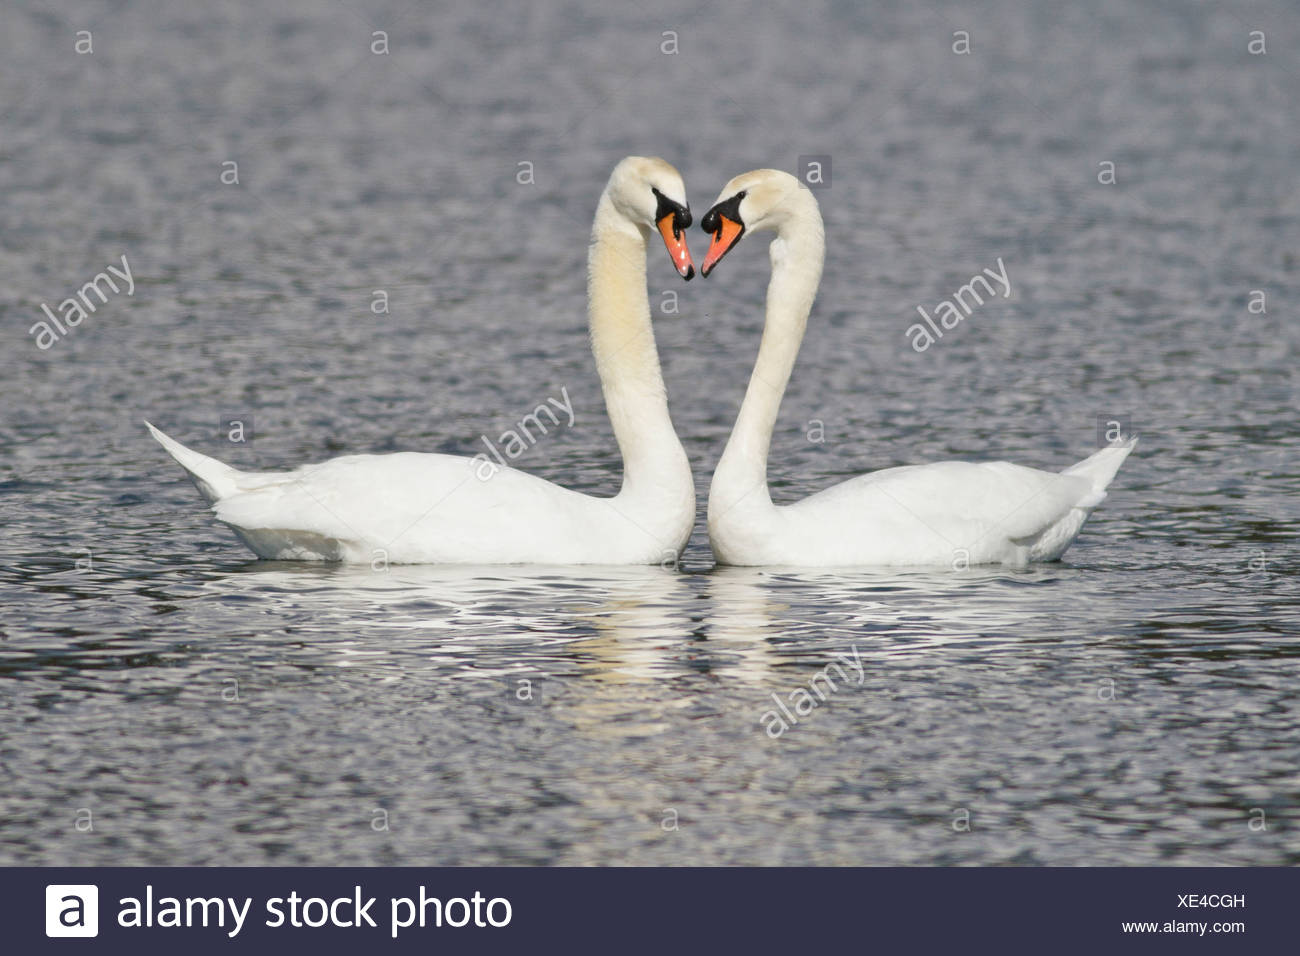 Mute Swan (Cygnus olor) swimming in a pond near Victoria, BC, Canada. Stock Photo